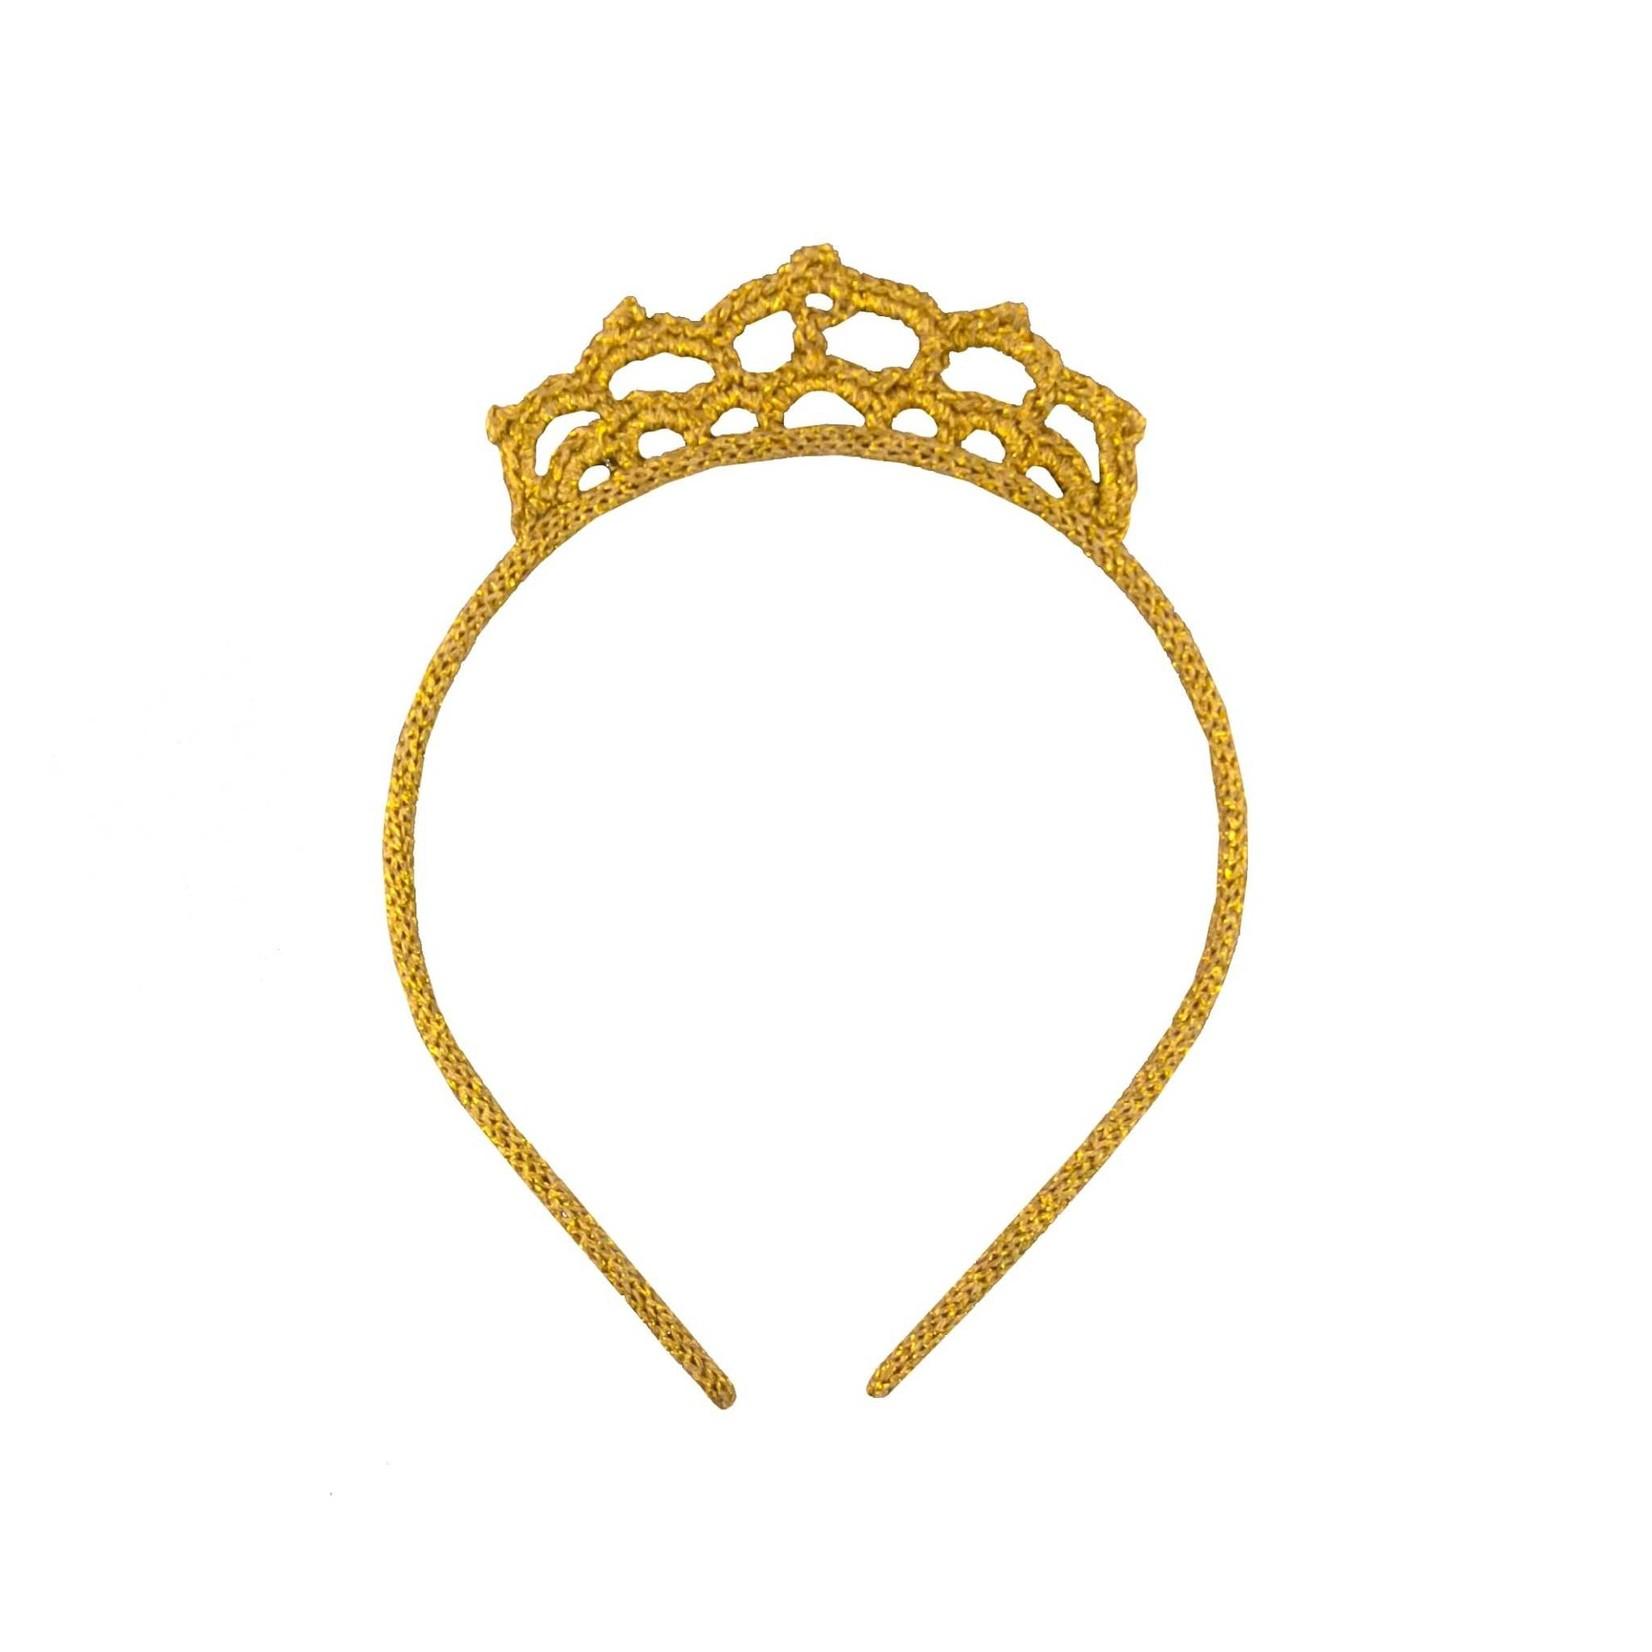 GLOBAL AFFAIRS GLOBAL AFFAIRS. Hairband Crown Gold